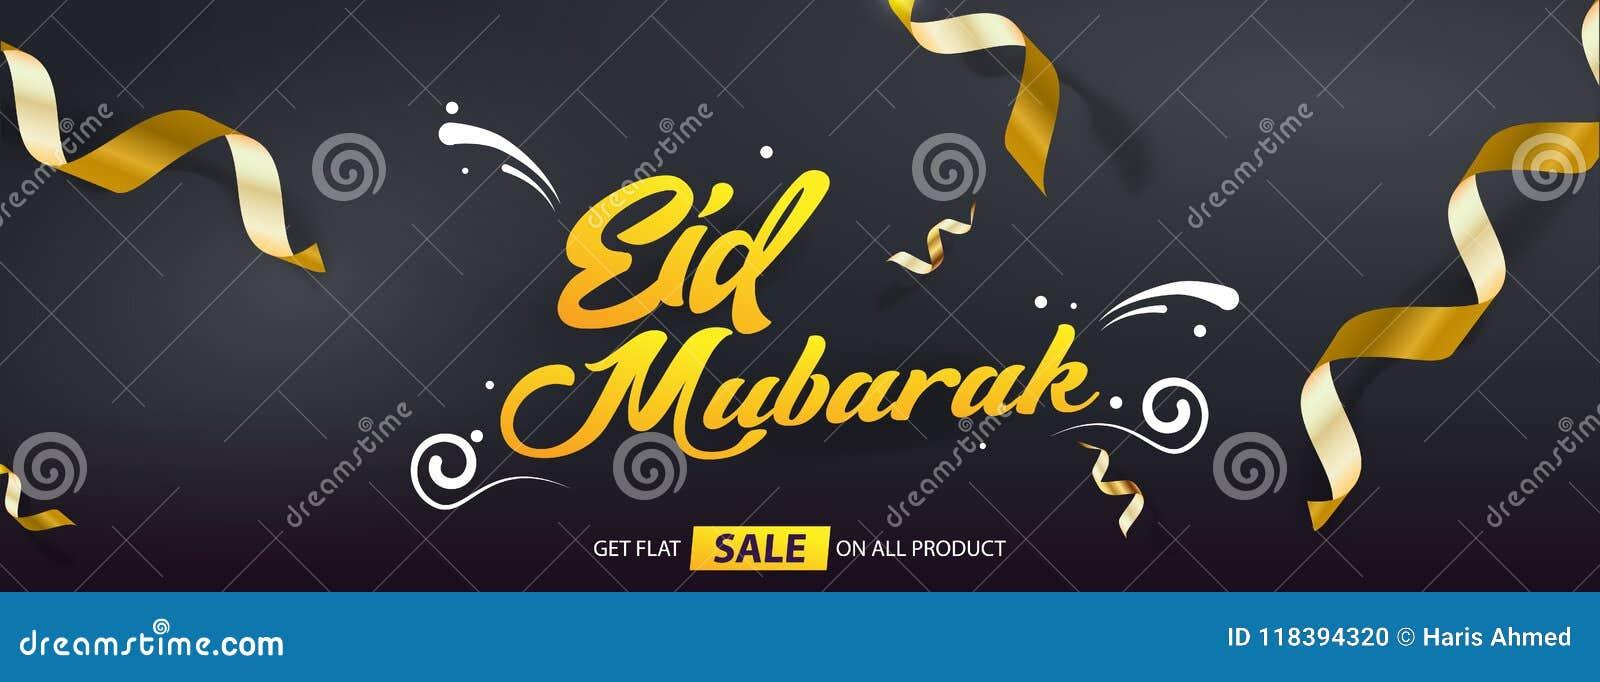 Eid穆巴拉克销售提议传染媒介模板设计盖子横幅